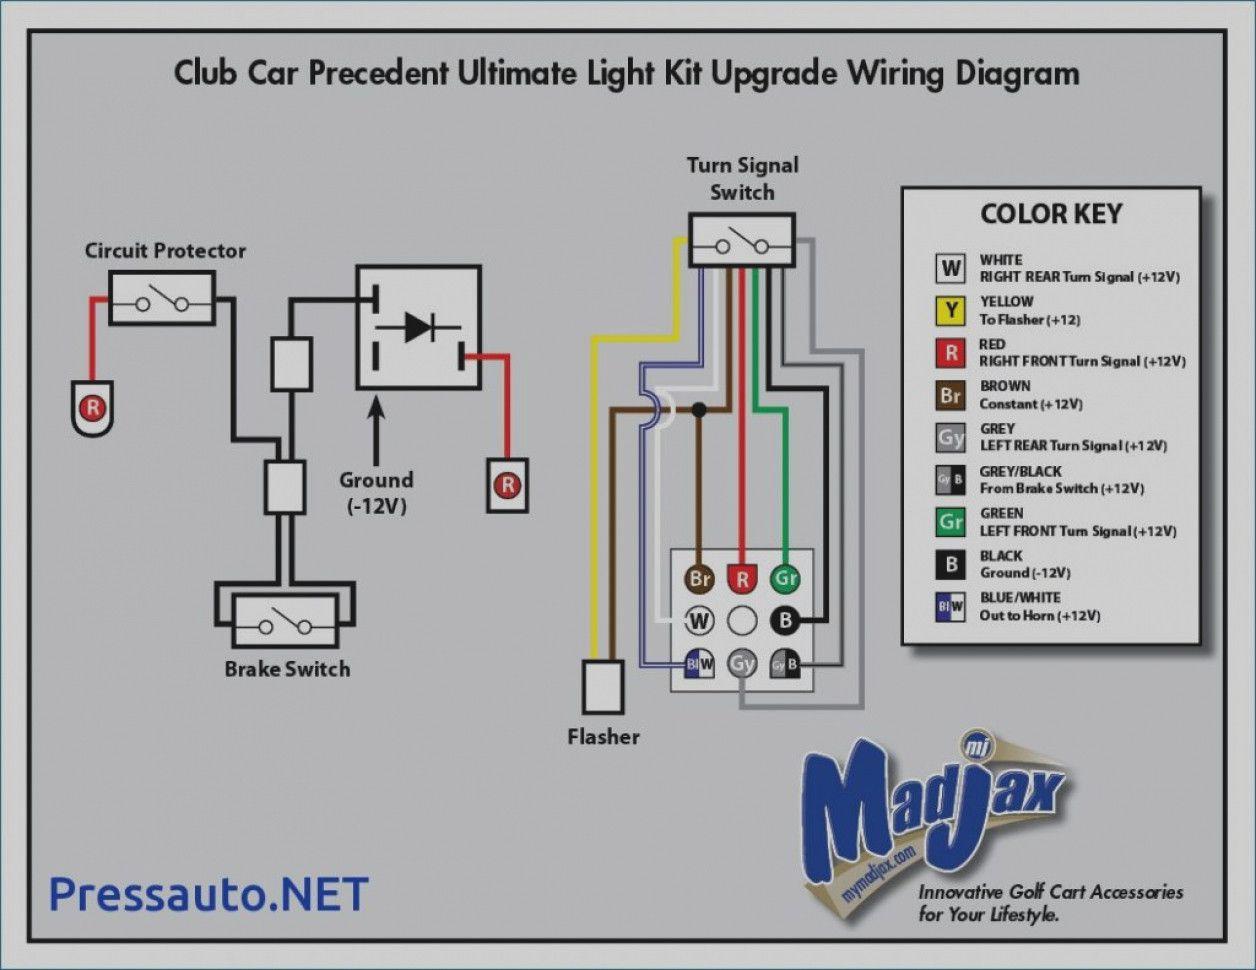 Car Ignition Diagram Trailer light wiring, Light switch